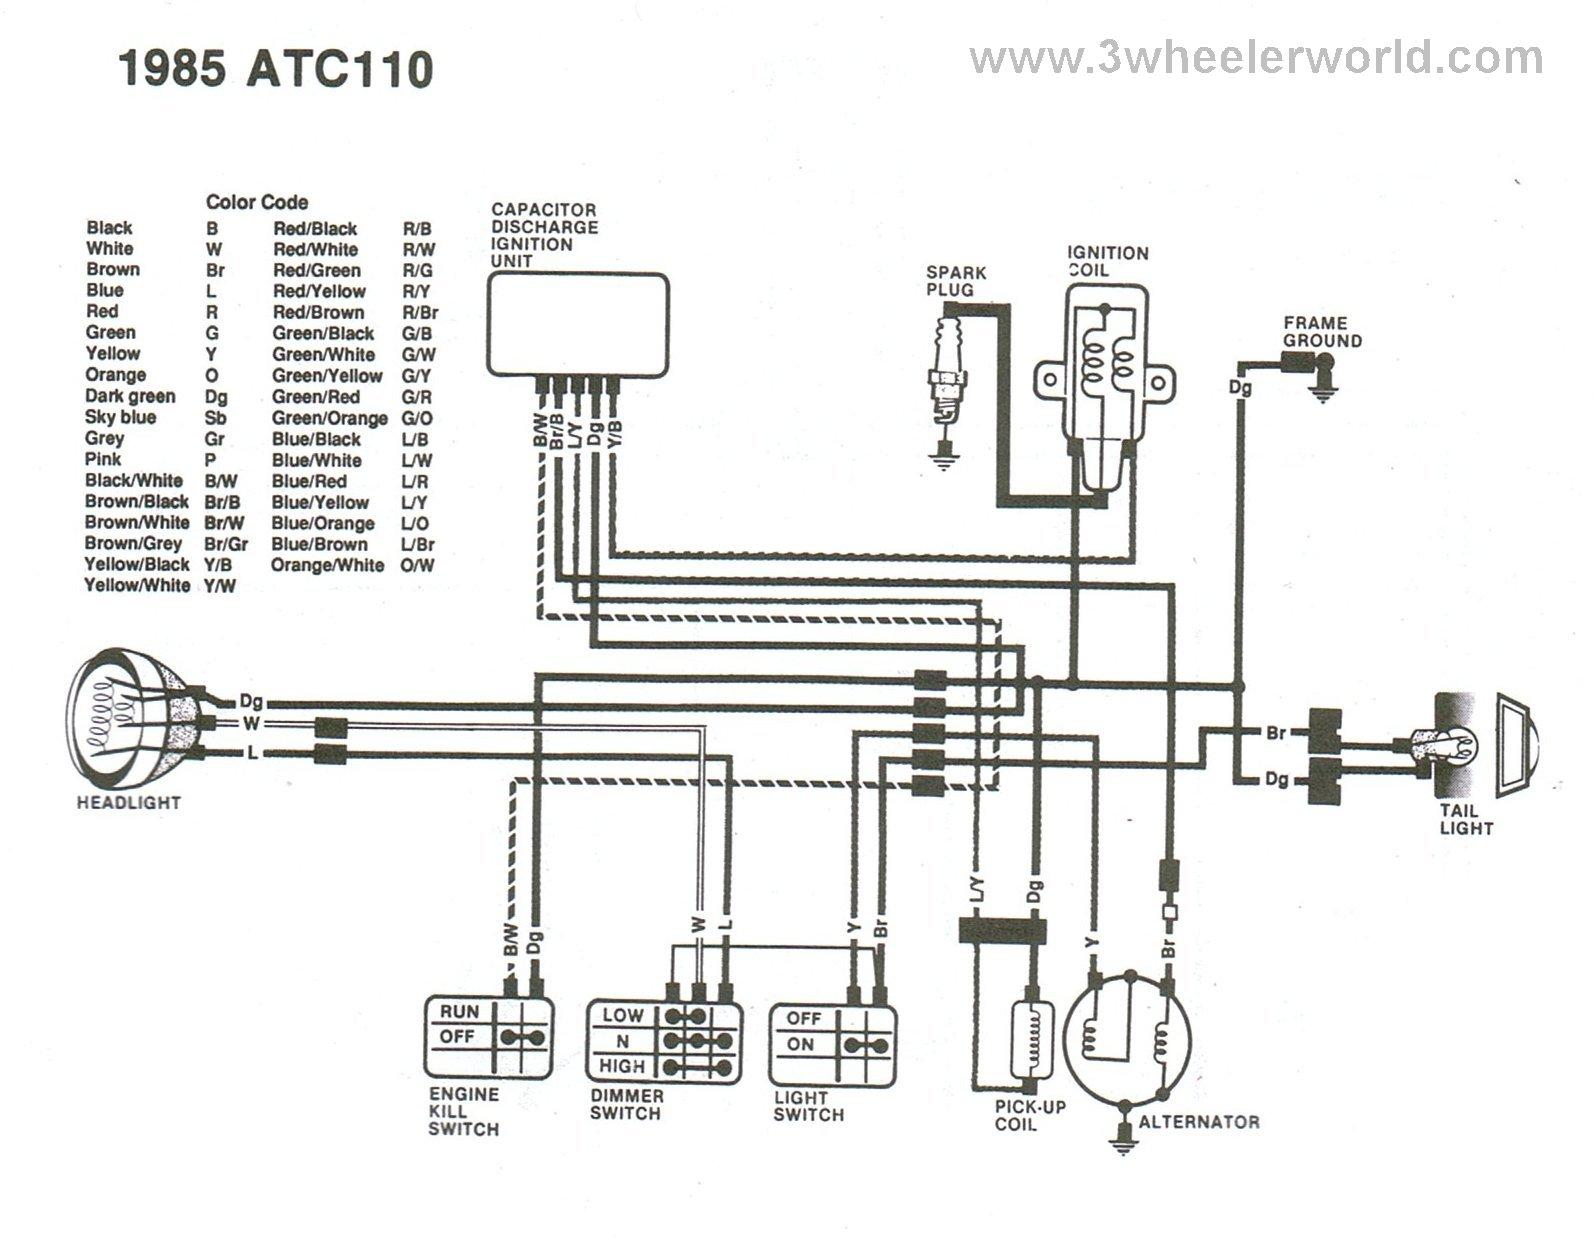 atc 110 wiring diagram  | 2411 x 1711